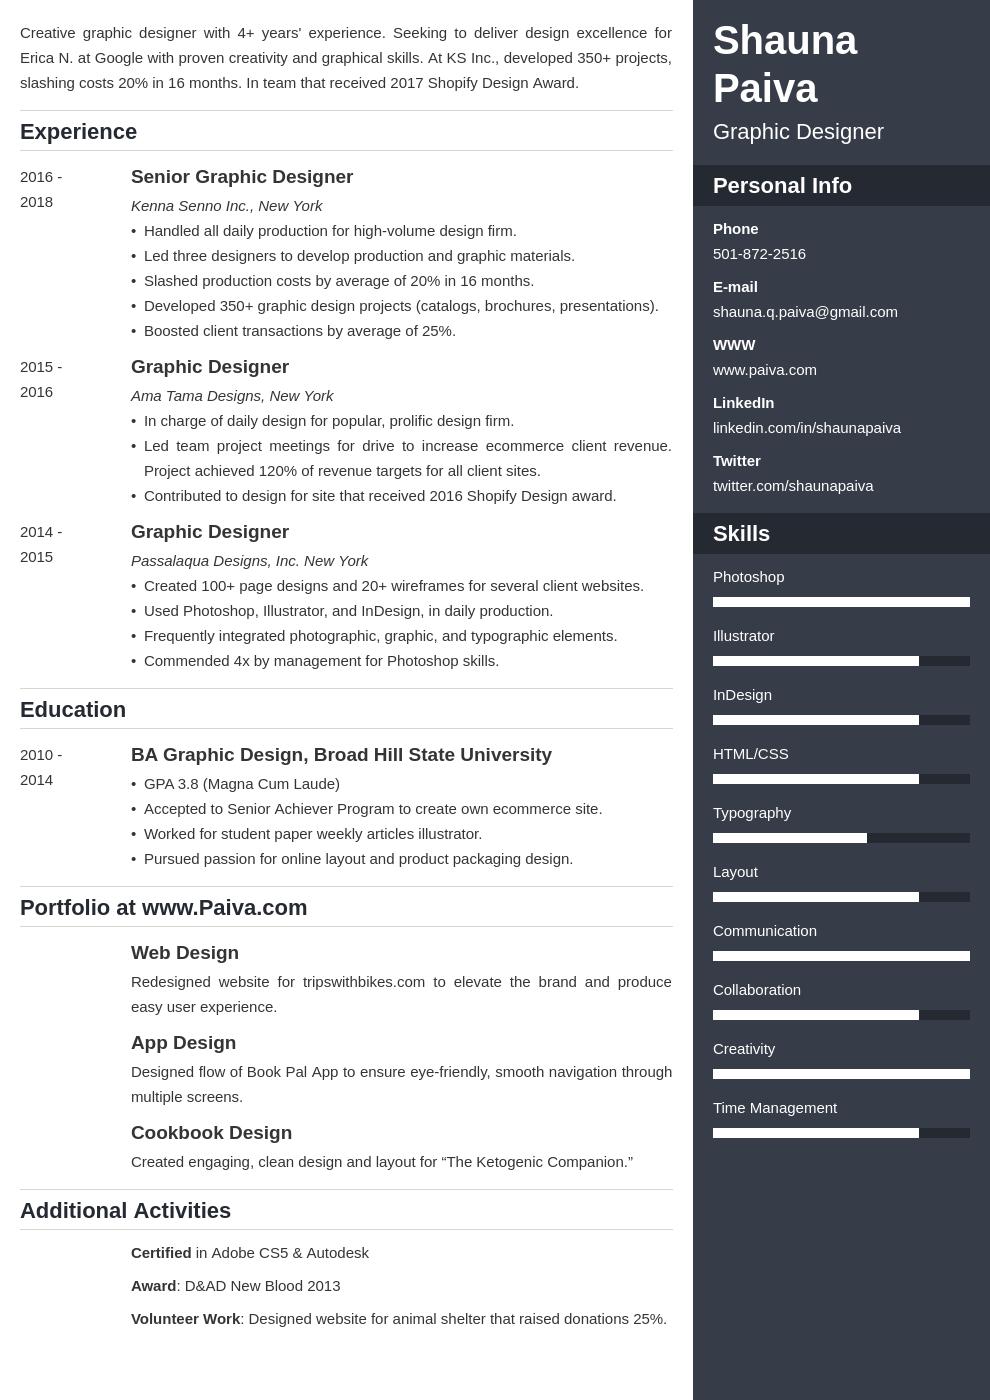 graphic design template enfold uk